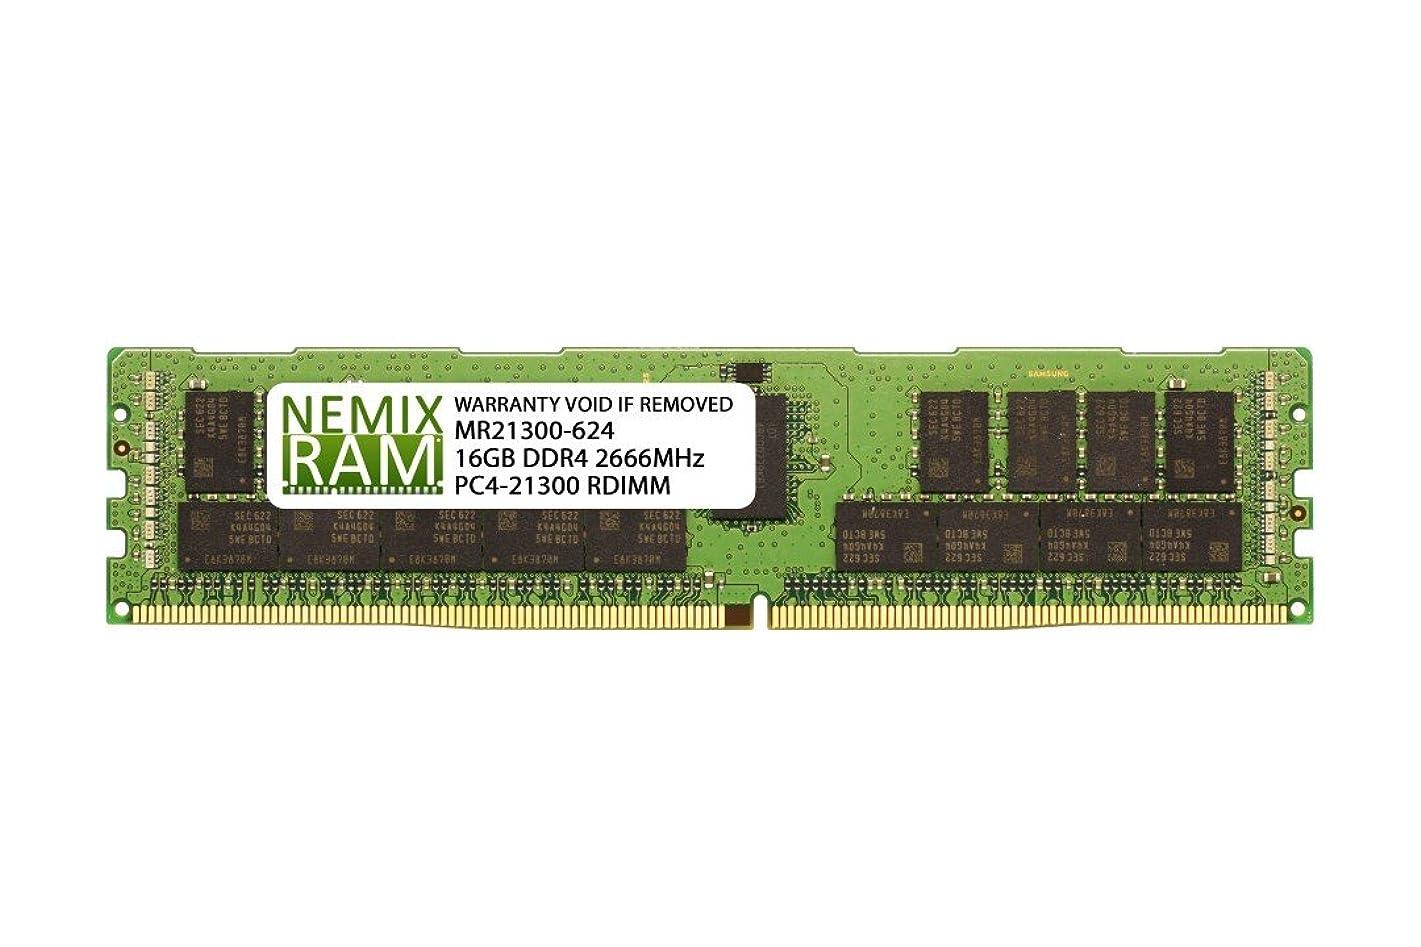 NEMIX RAM 16GB DDR4-2666 2Rx4 RDIMM for Intel S2600KPR